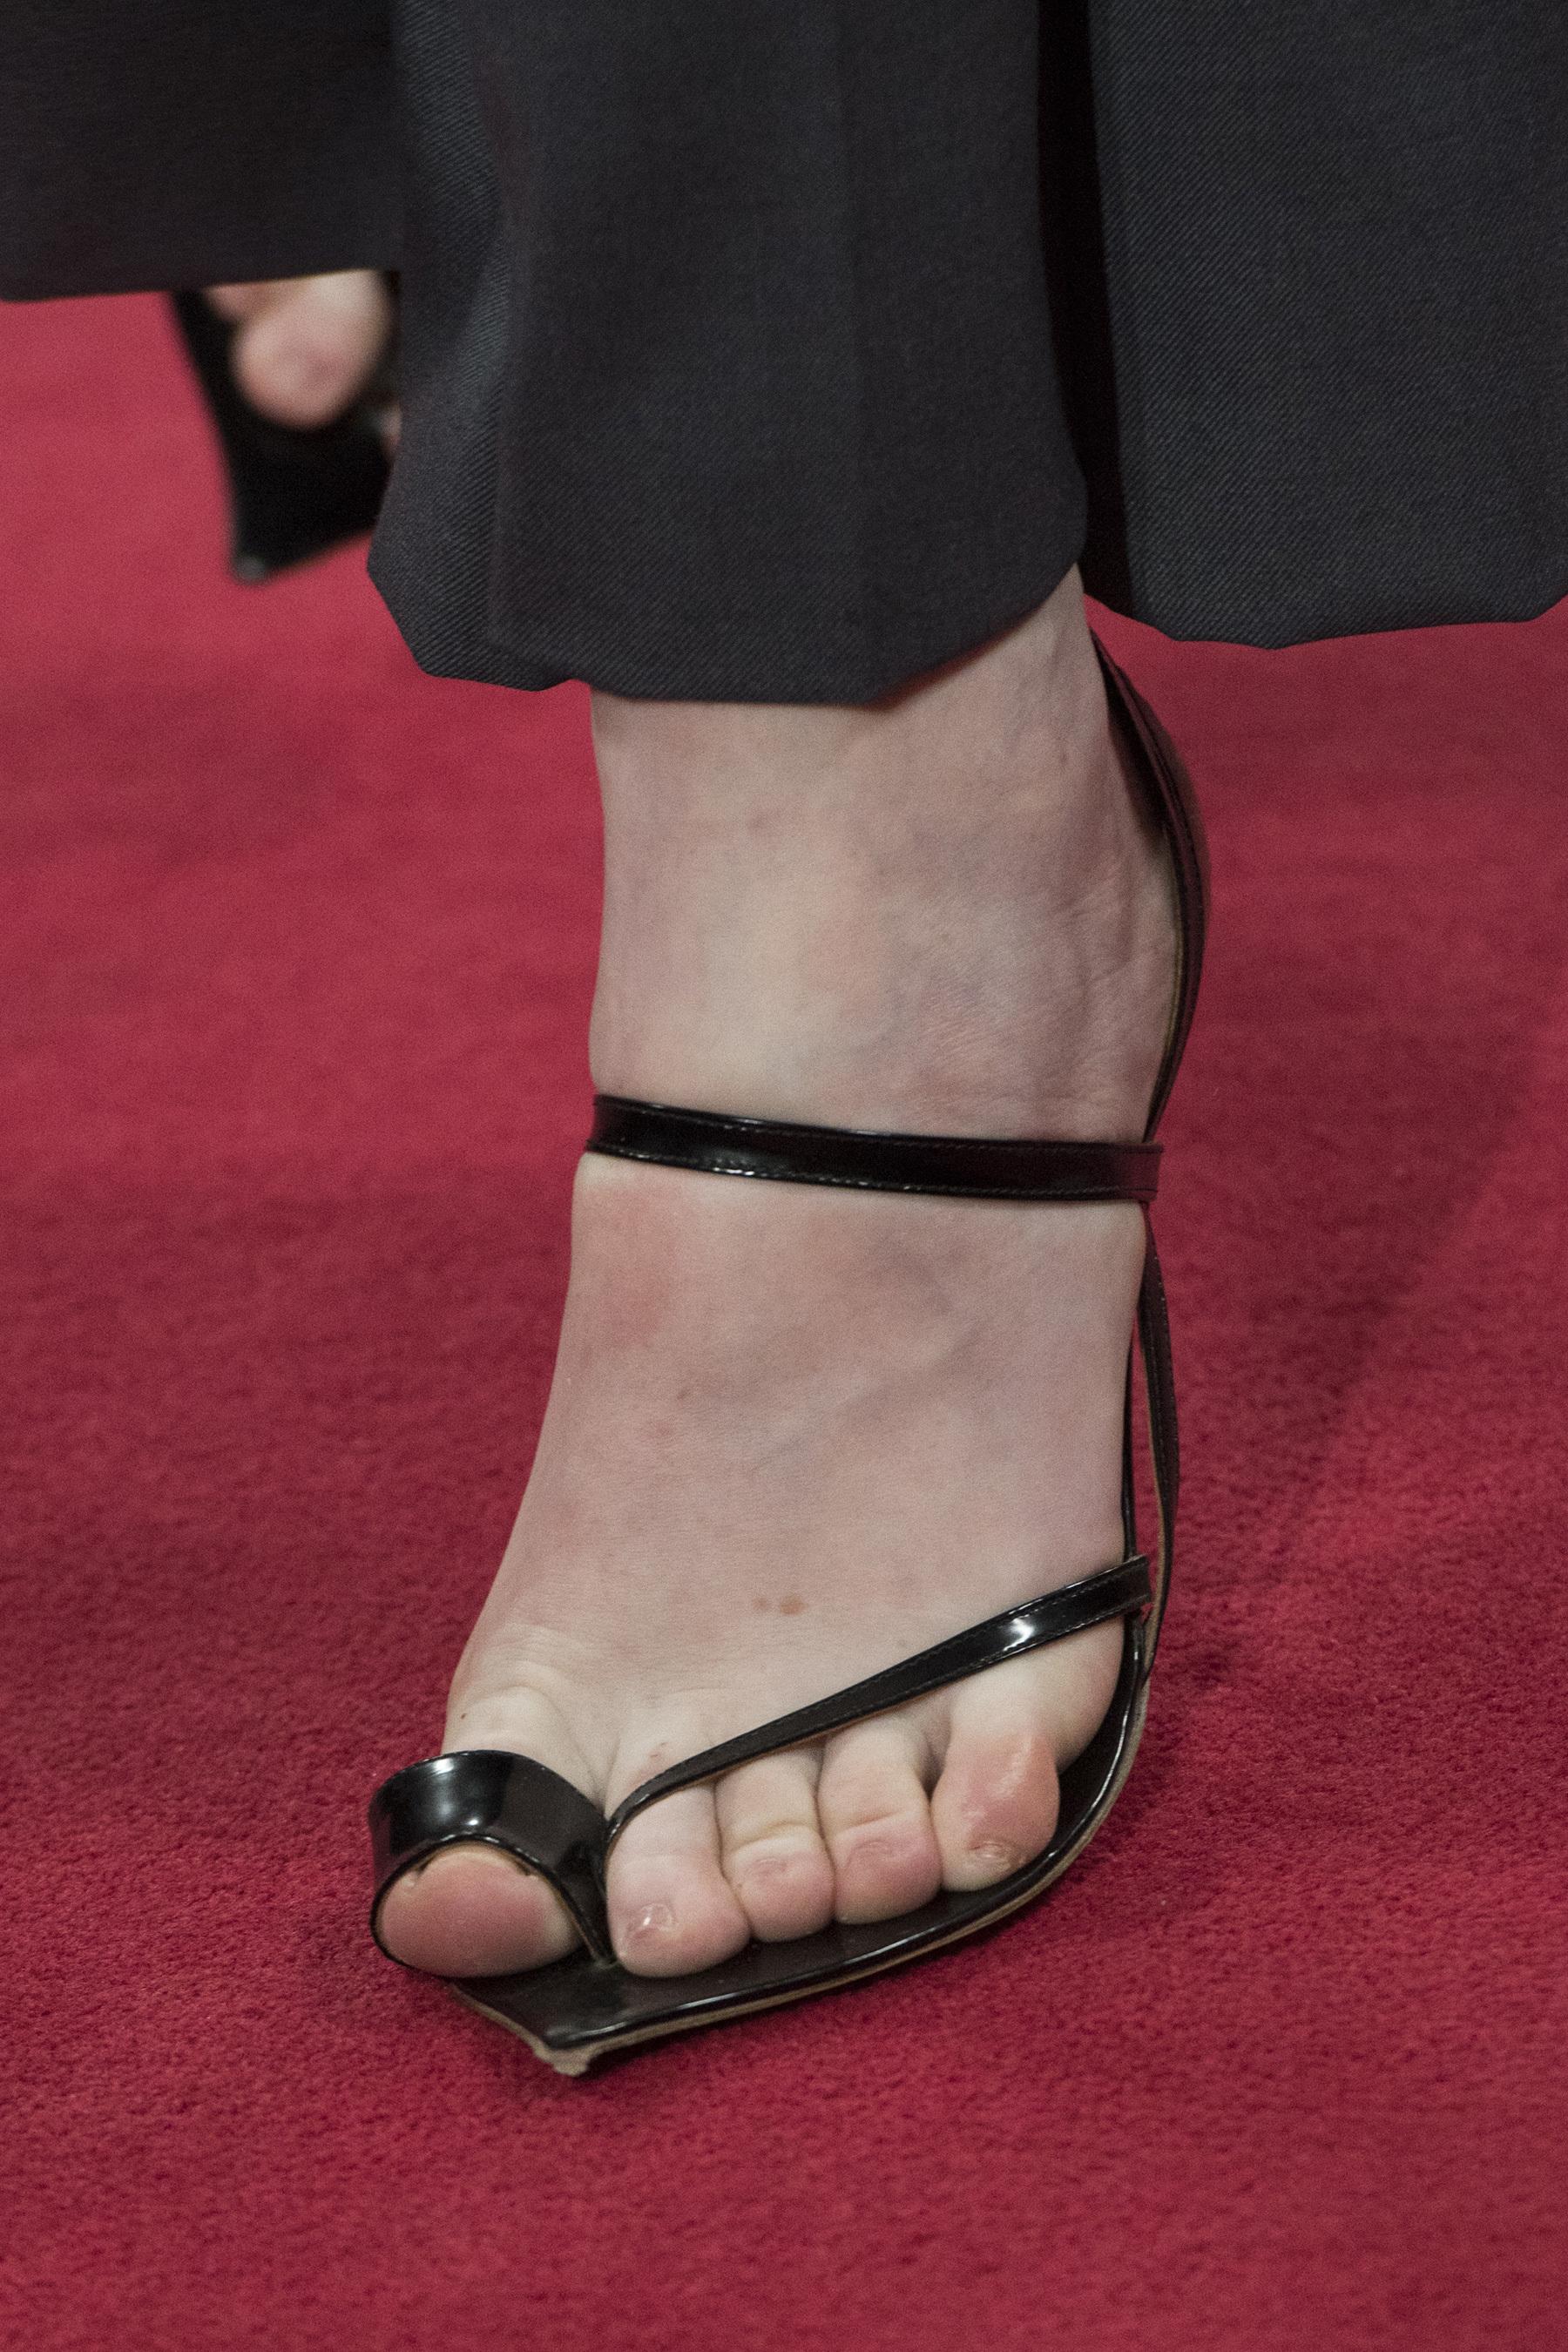 Brooke Durrant's Feet